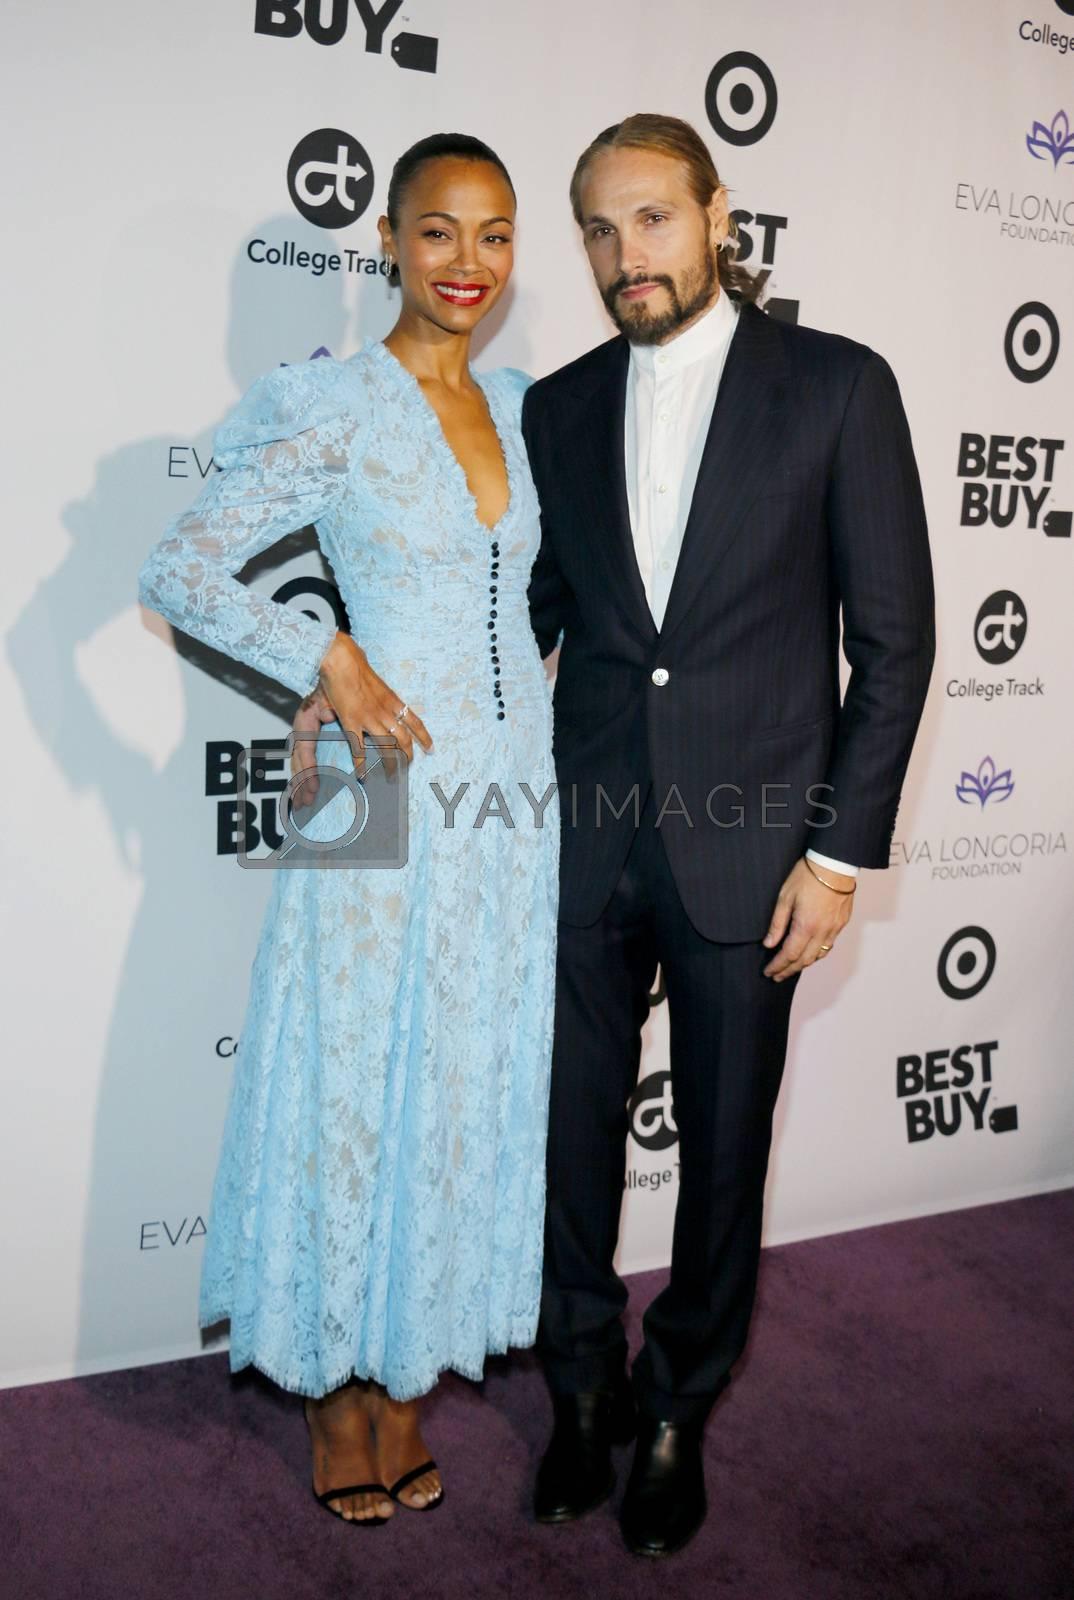 Zoe Saldana and Marco Perego Saldana at the Eva Longoria Foundation Dinner Gala held at the Four Seasons Hotel in Beverly Hills, USA on November 8, 2018.